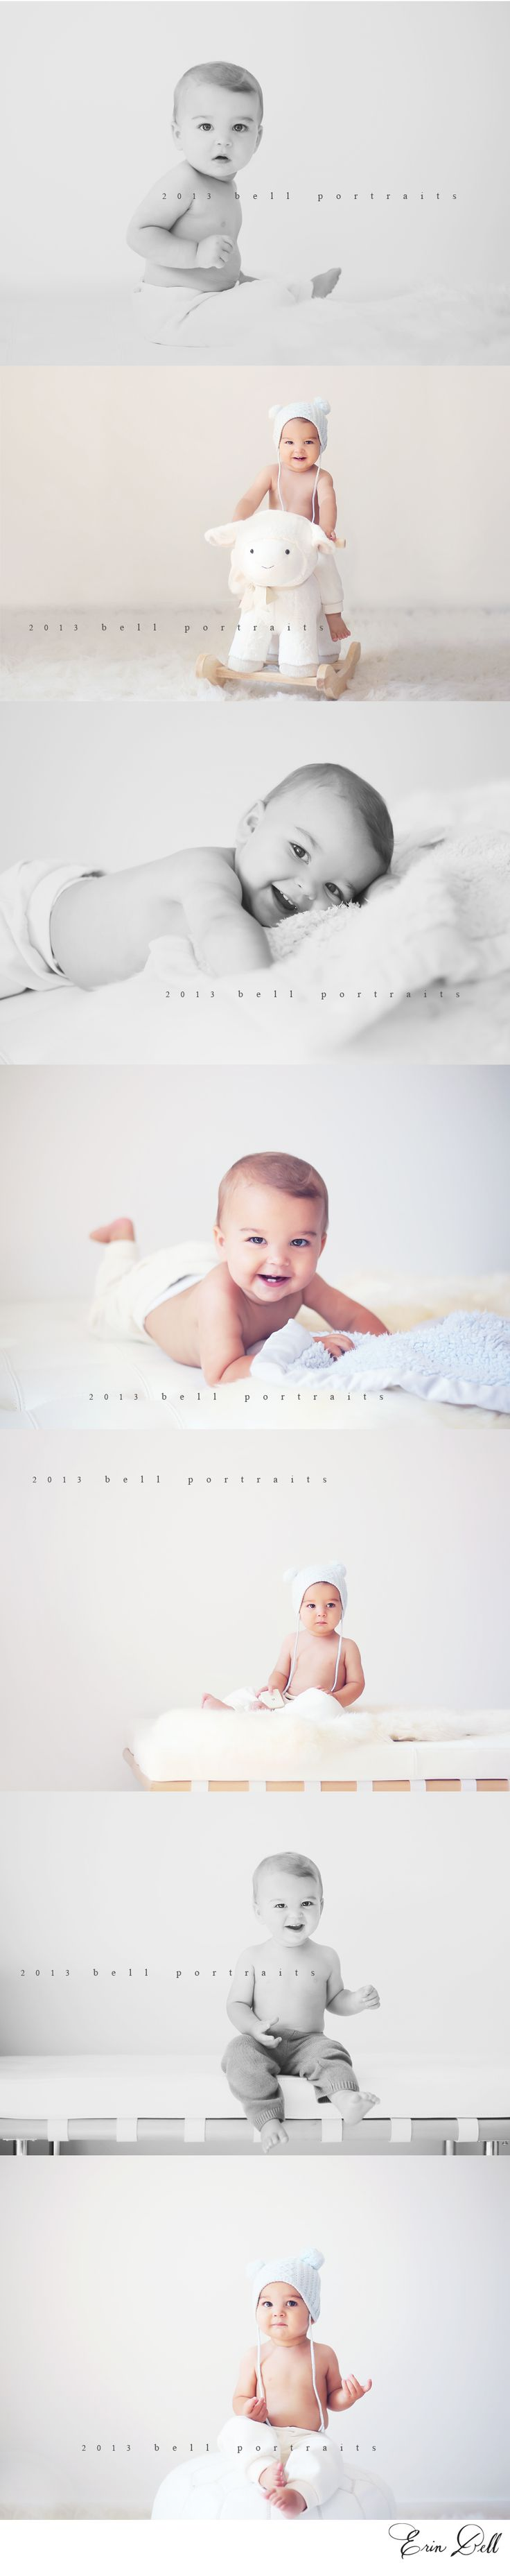 Bell Portraits | Connecticut Newborn, Baby, Children's, Family Photography » A Westport, CT Children's Photography Studio